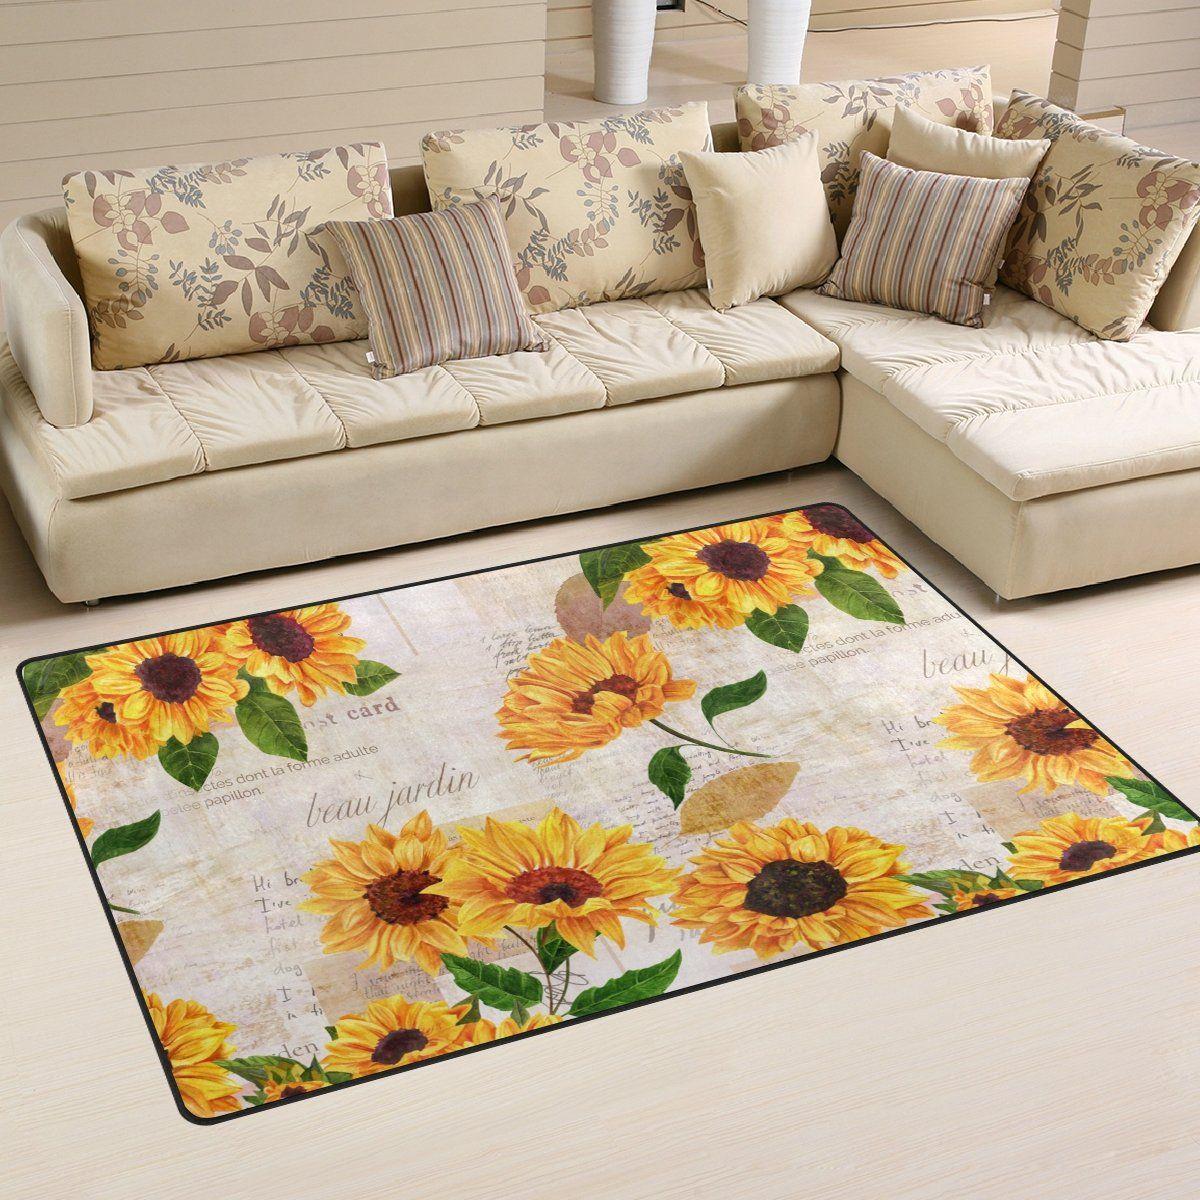 Yochoice Nonslip Area Rugs Home Decor Vintage Yellow Watercolor Sunflower Floral Floor Mat Living Room Bedroom Carp Dinning Room Decor Bedroom Carpet Area Rugs #sunflower #rugs #for #living #room